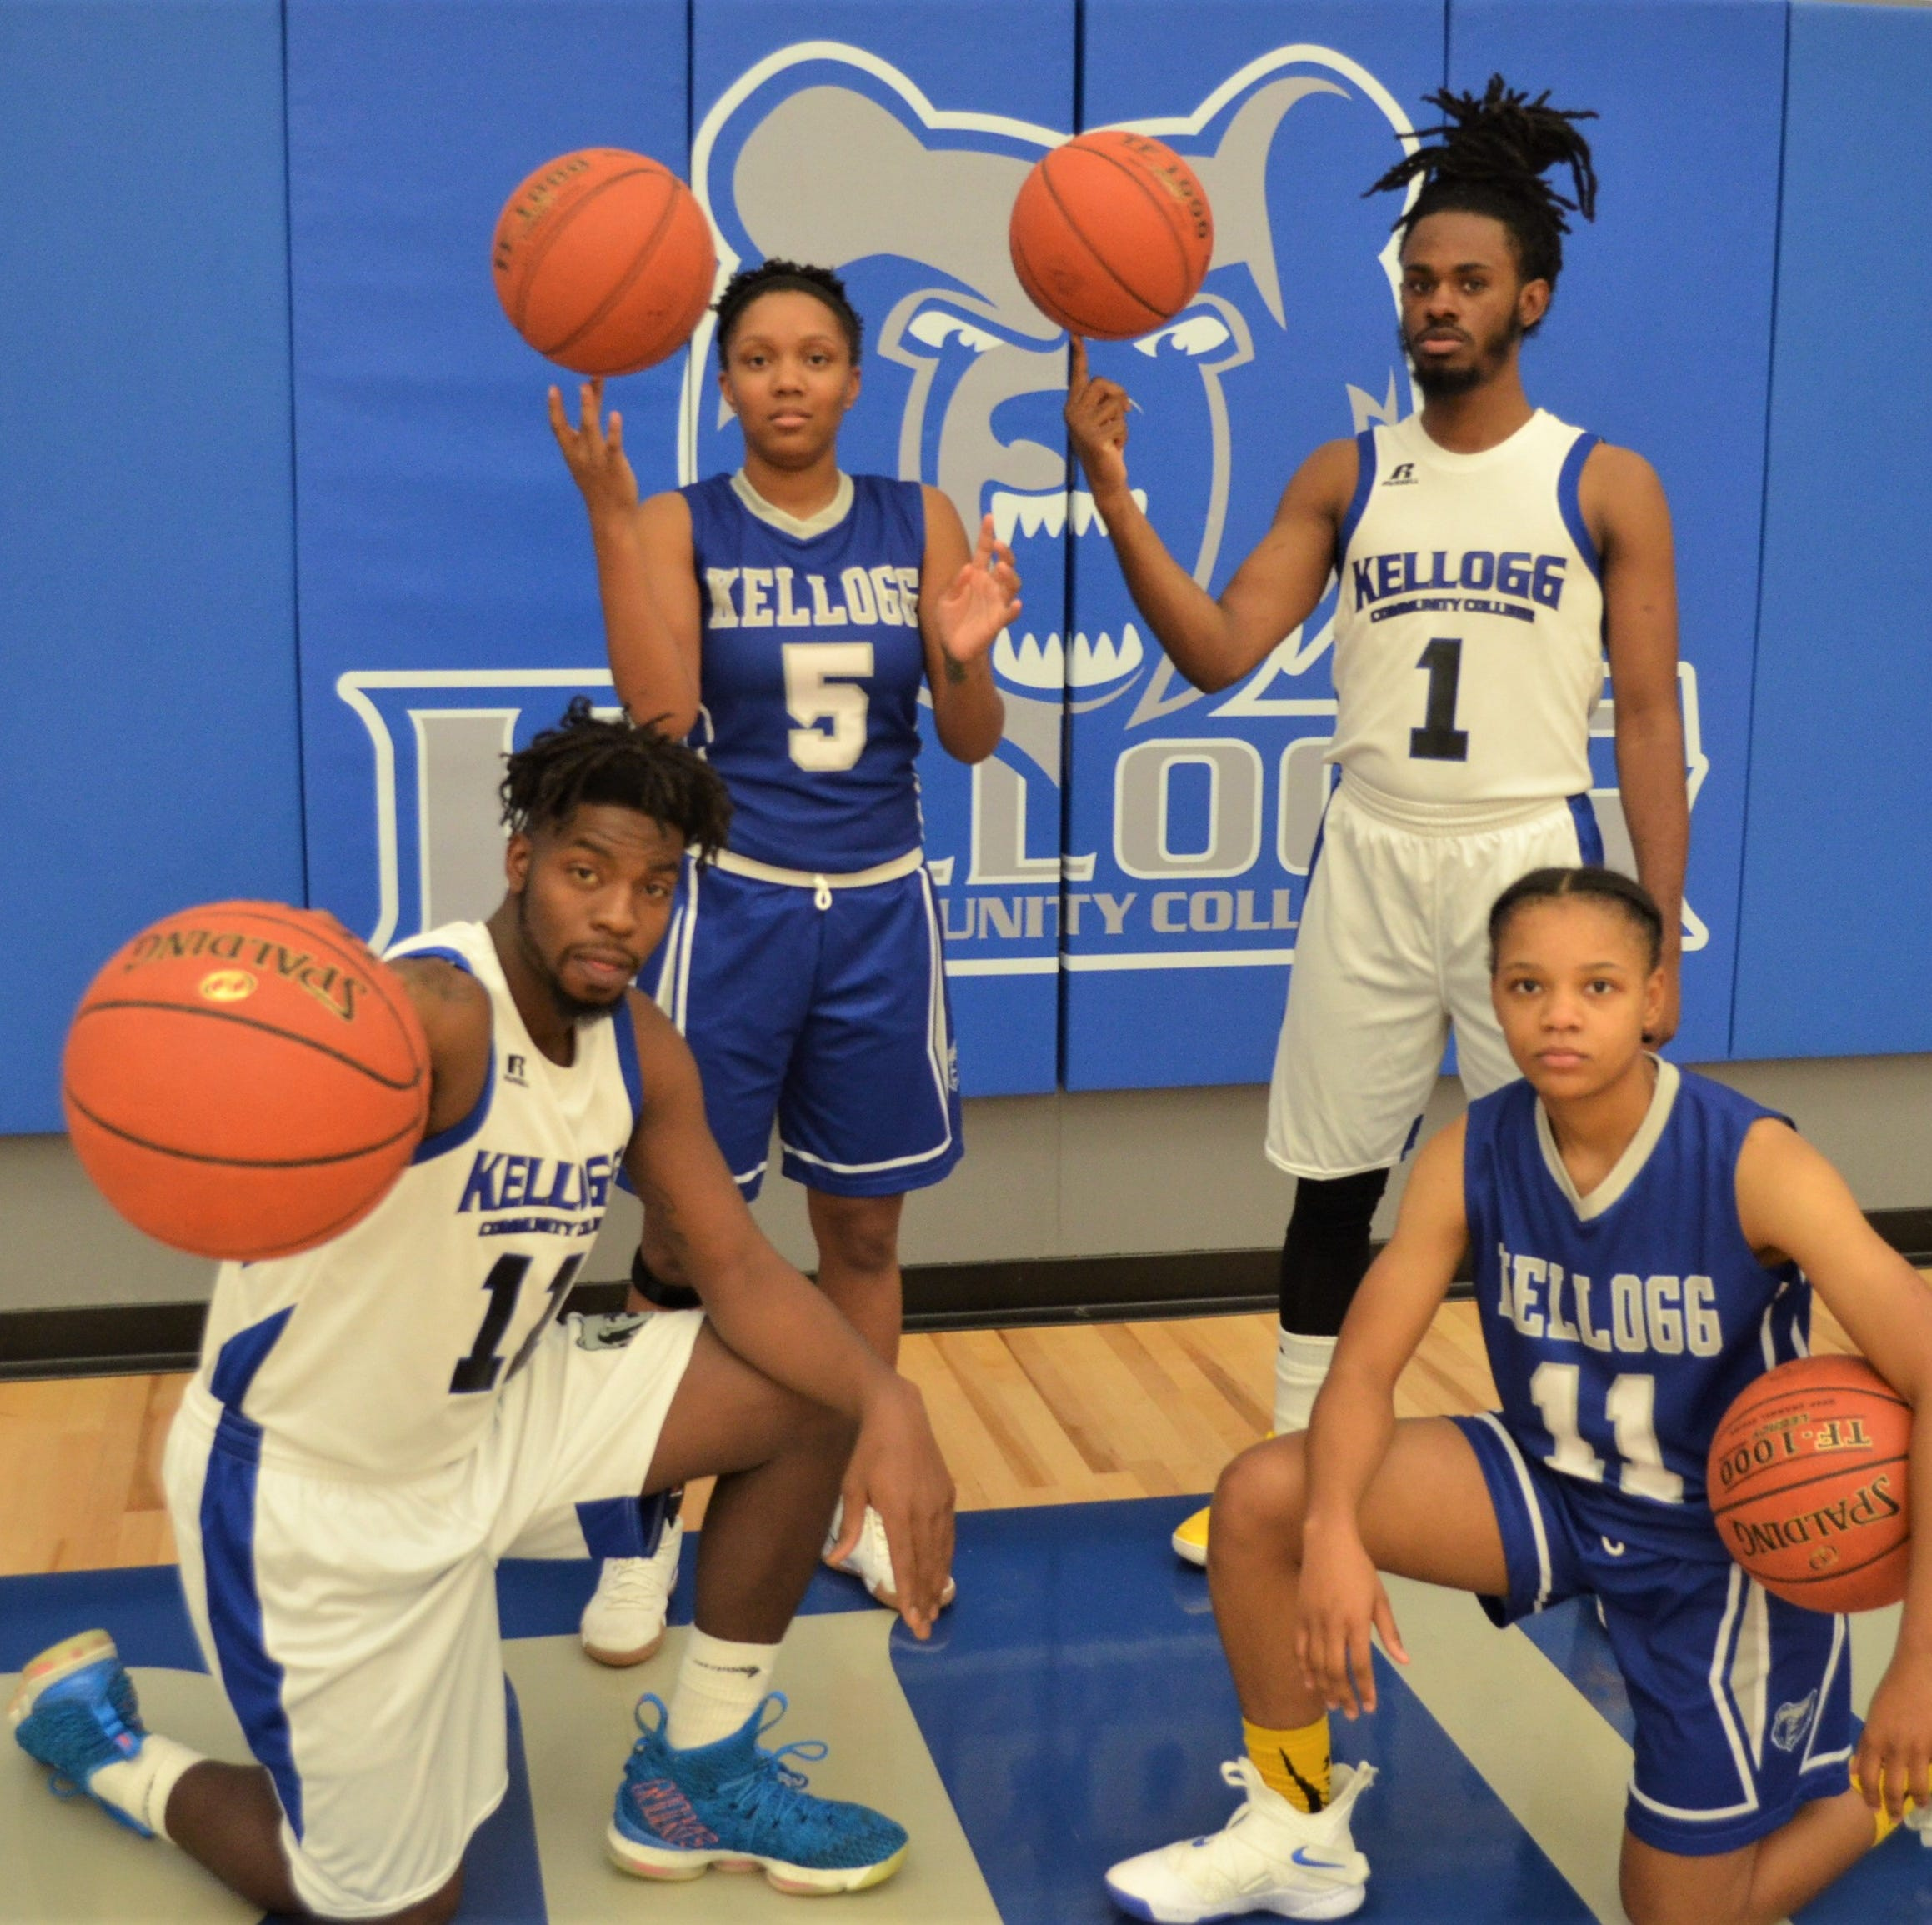 Kellogg Community College tips off new era of men's, women's basketball in new gym